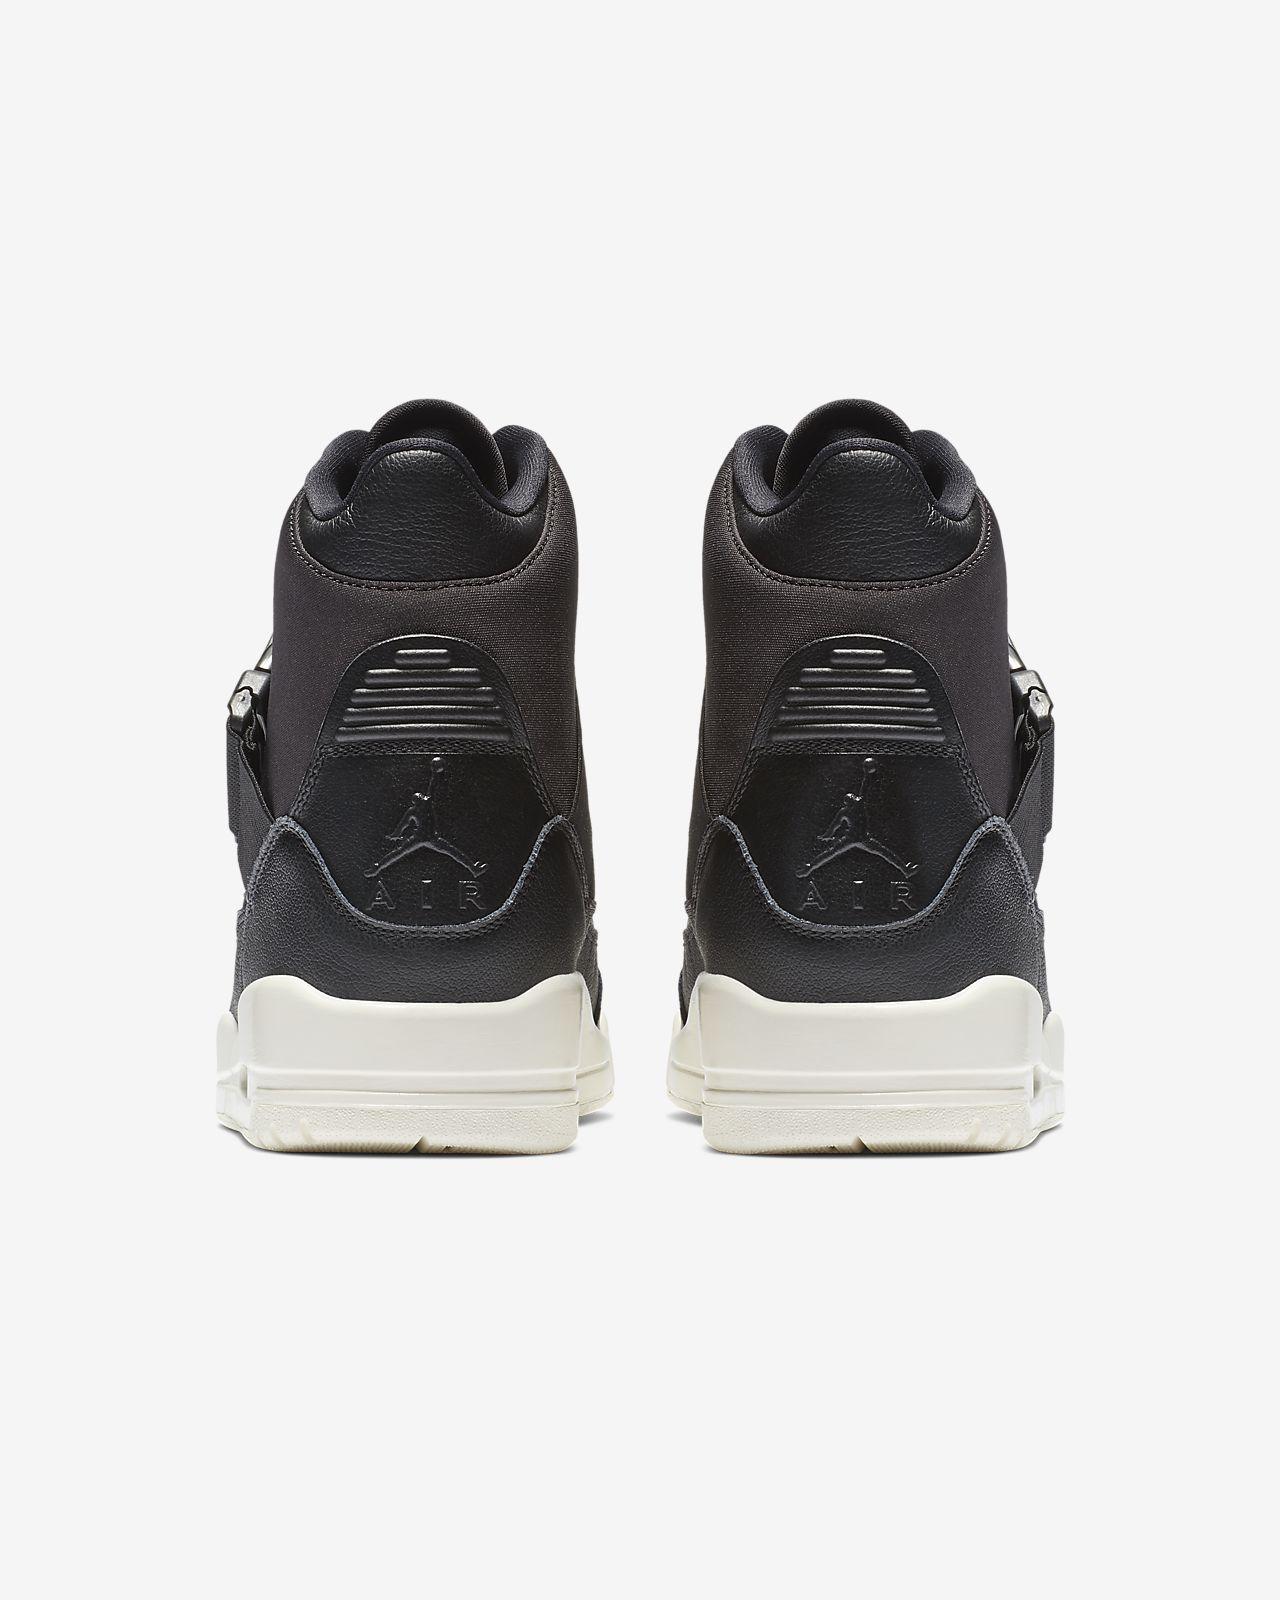 3677c6942095a7 Air Jordan 3 Retro Explorer XX Women s Shoe. Nike.com